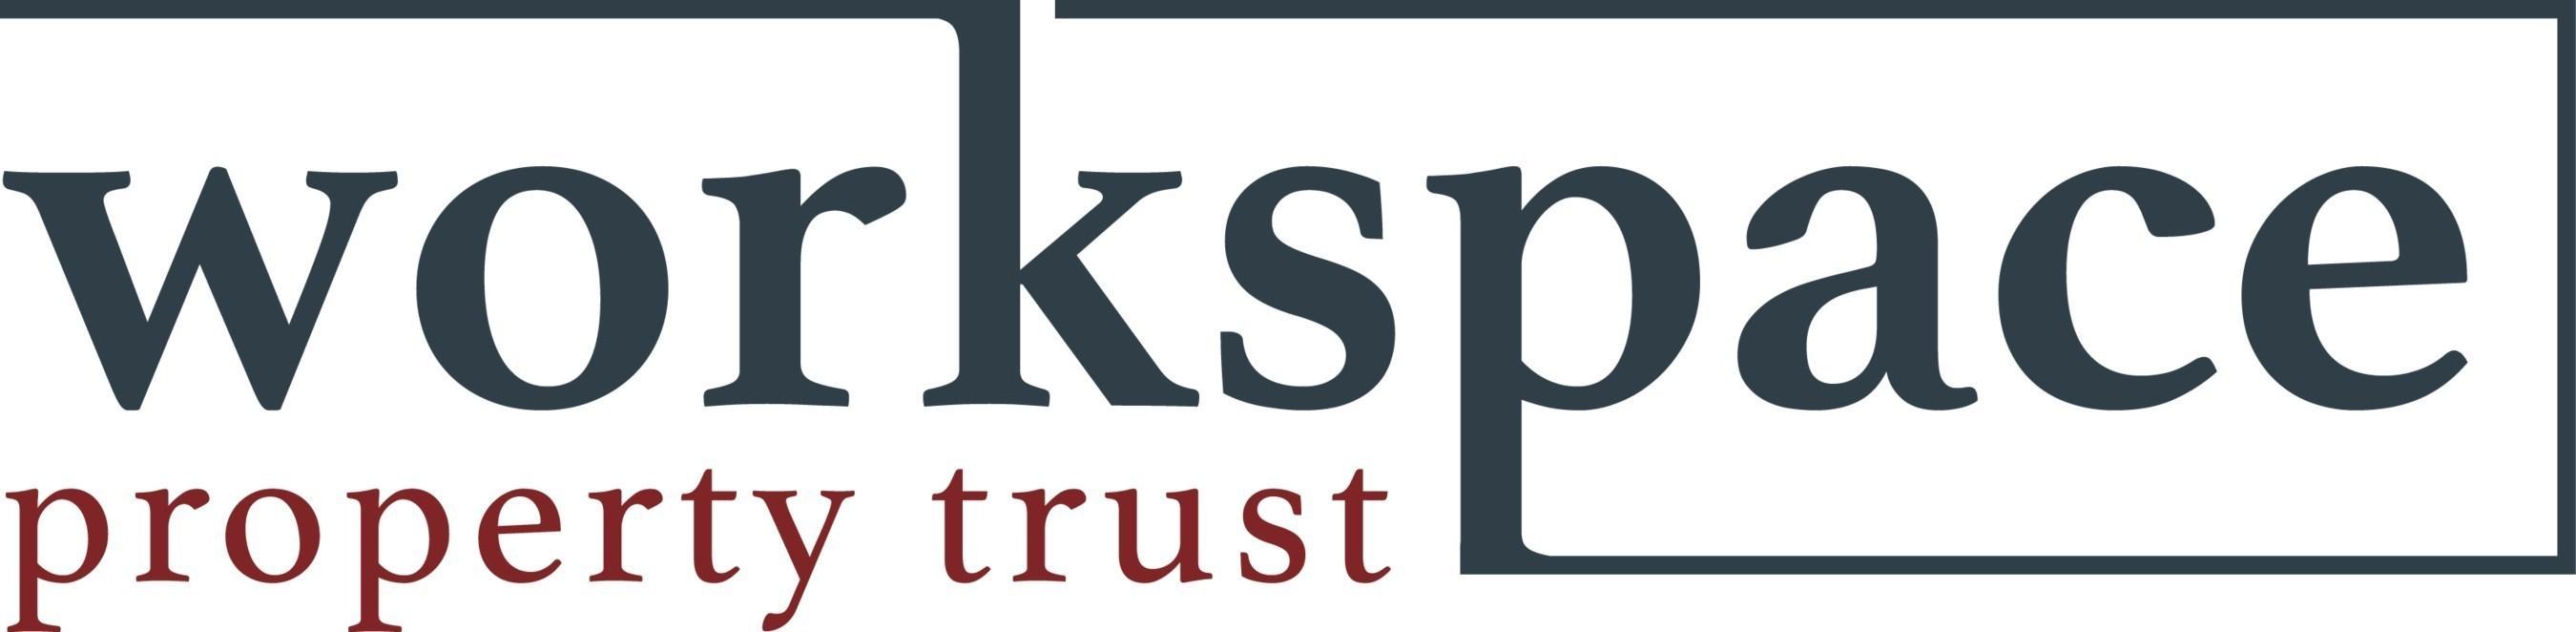 Workspace Property Trust Logo.